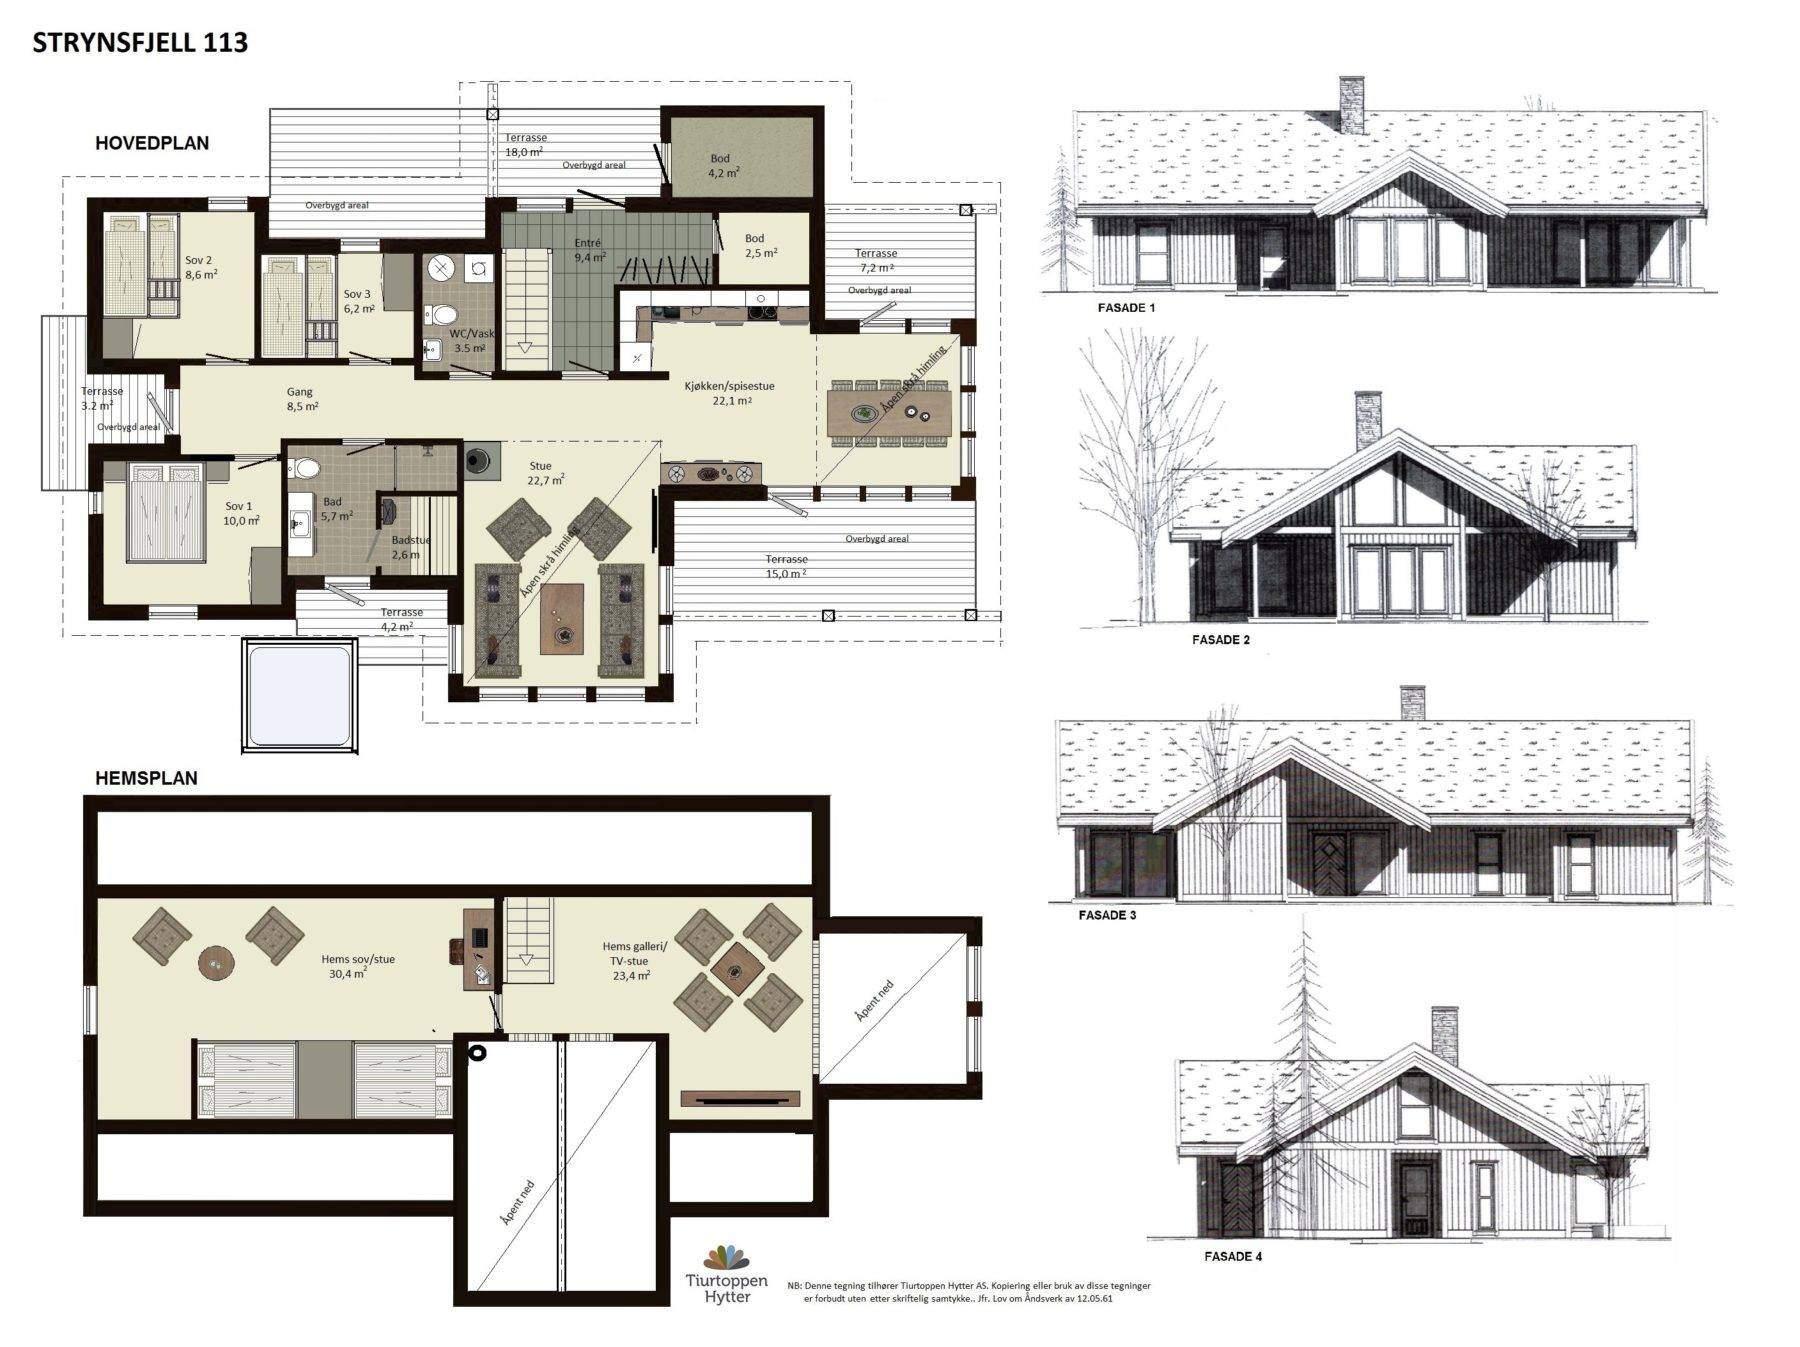 10 Strynsfjell 113 plan og fasader